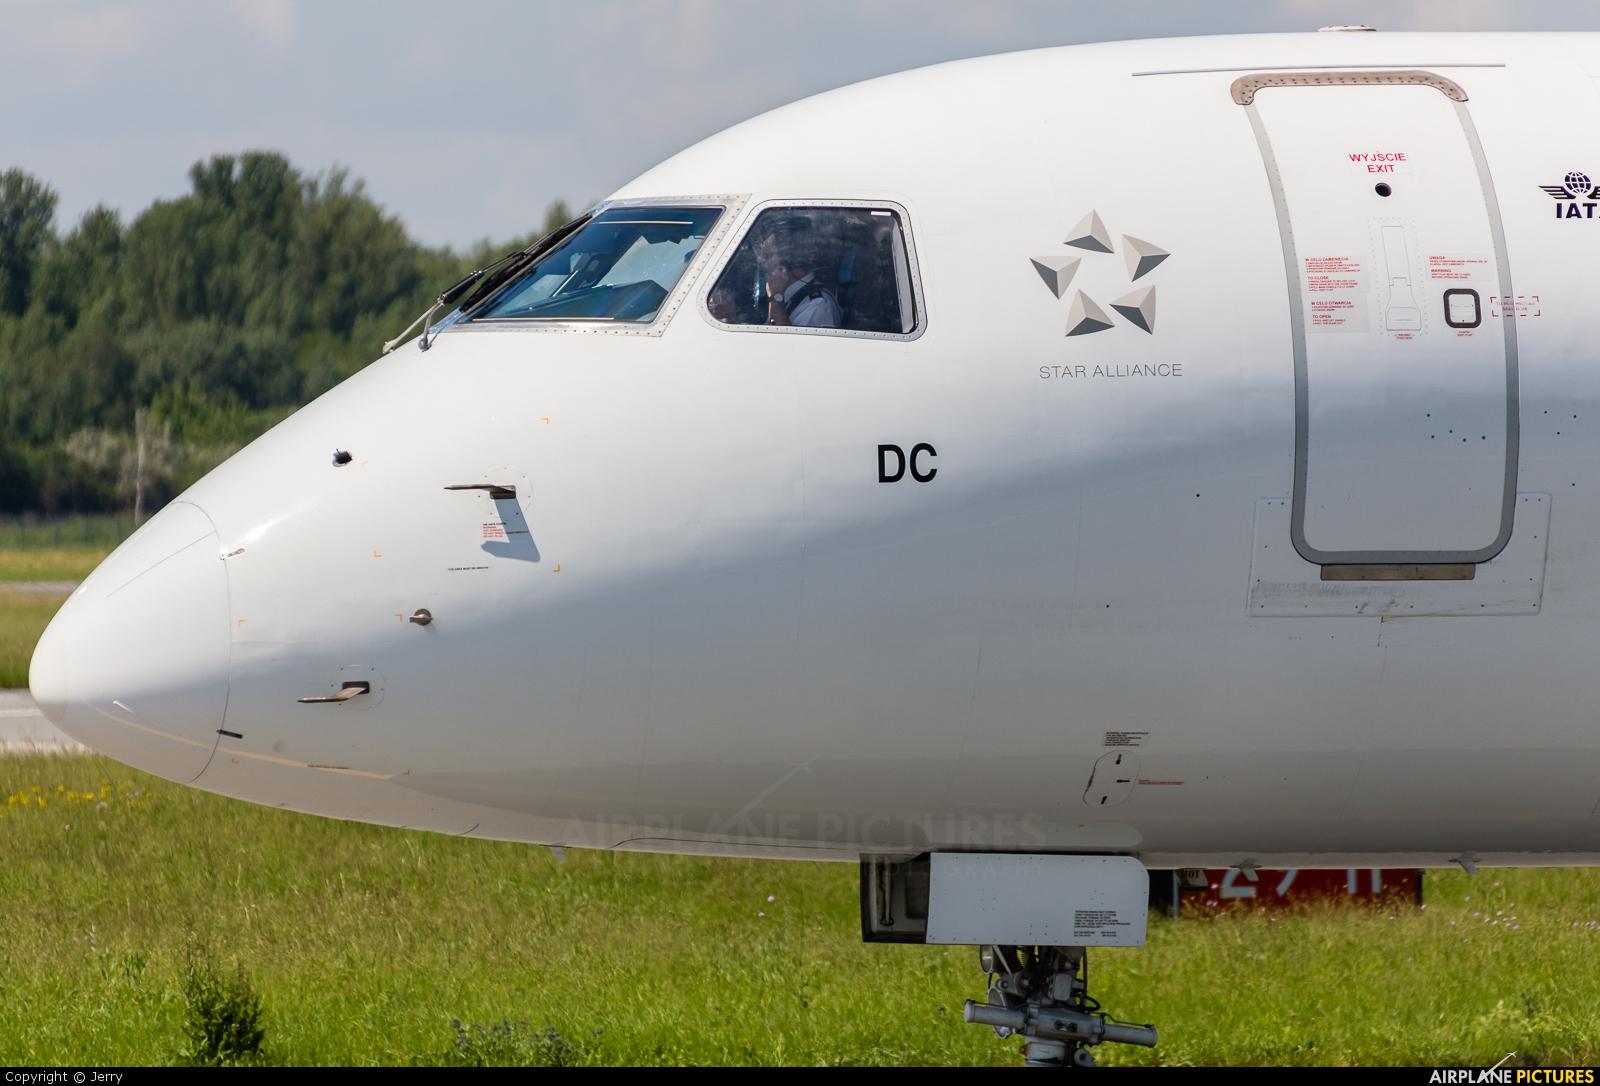 LOT - Polish Airlines SP-LDC aircraft at Warsaw - Frederic Chopin